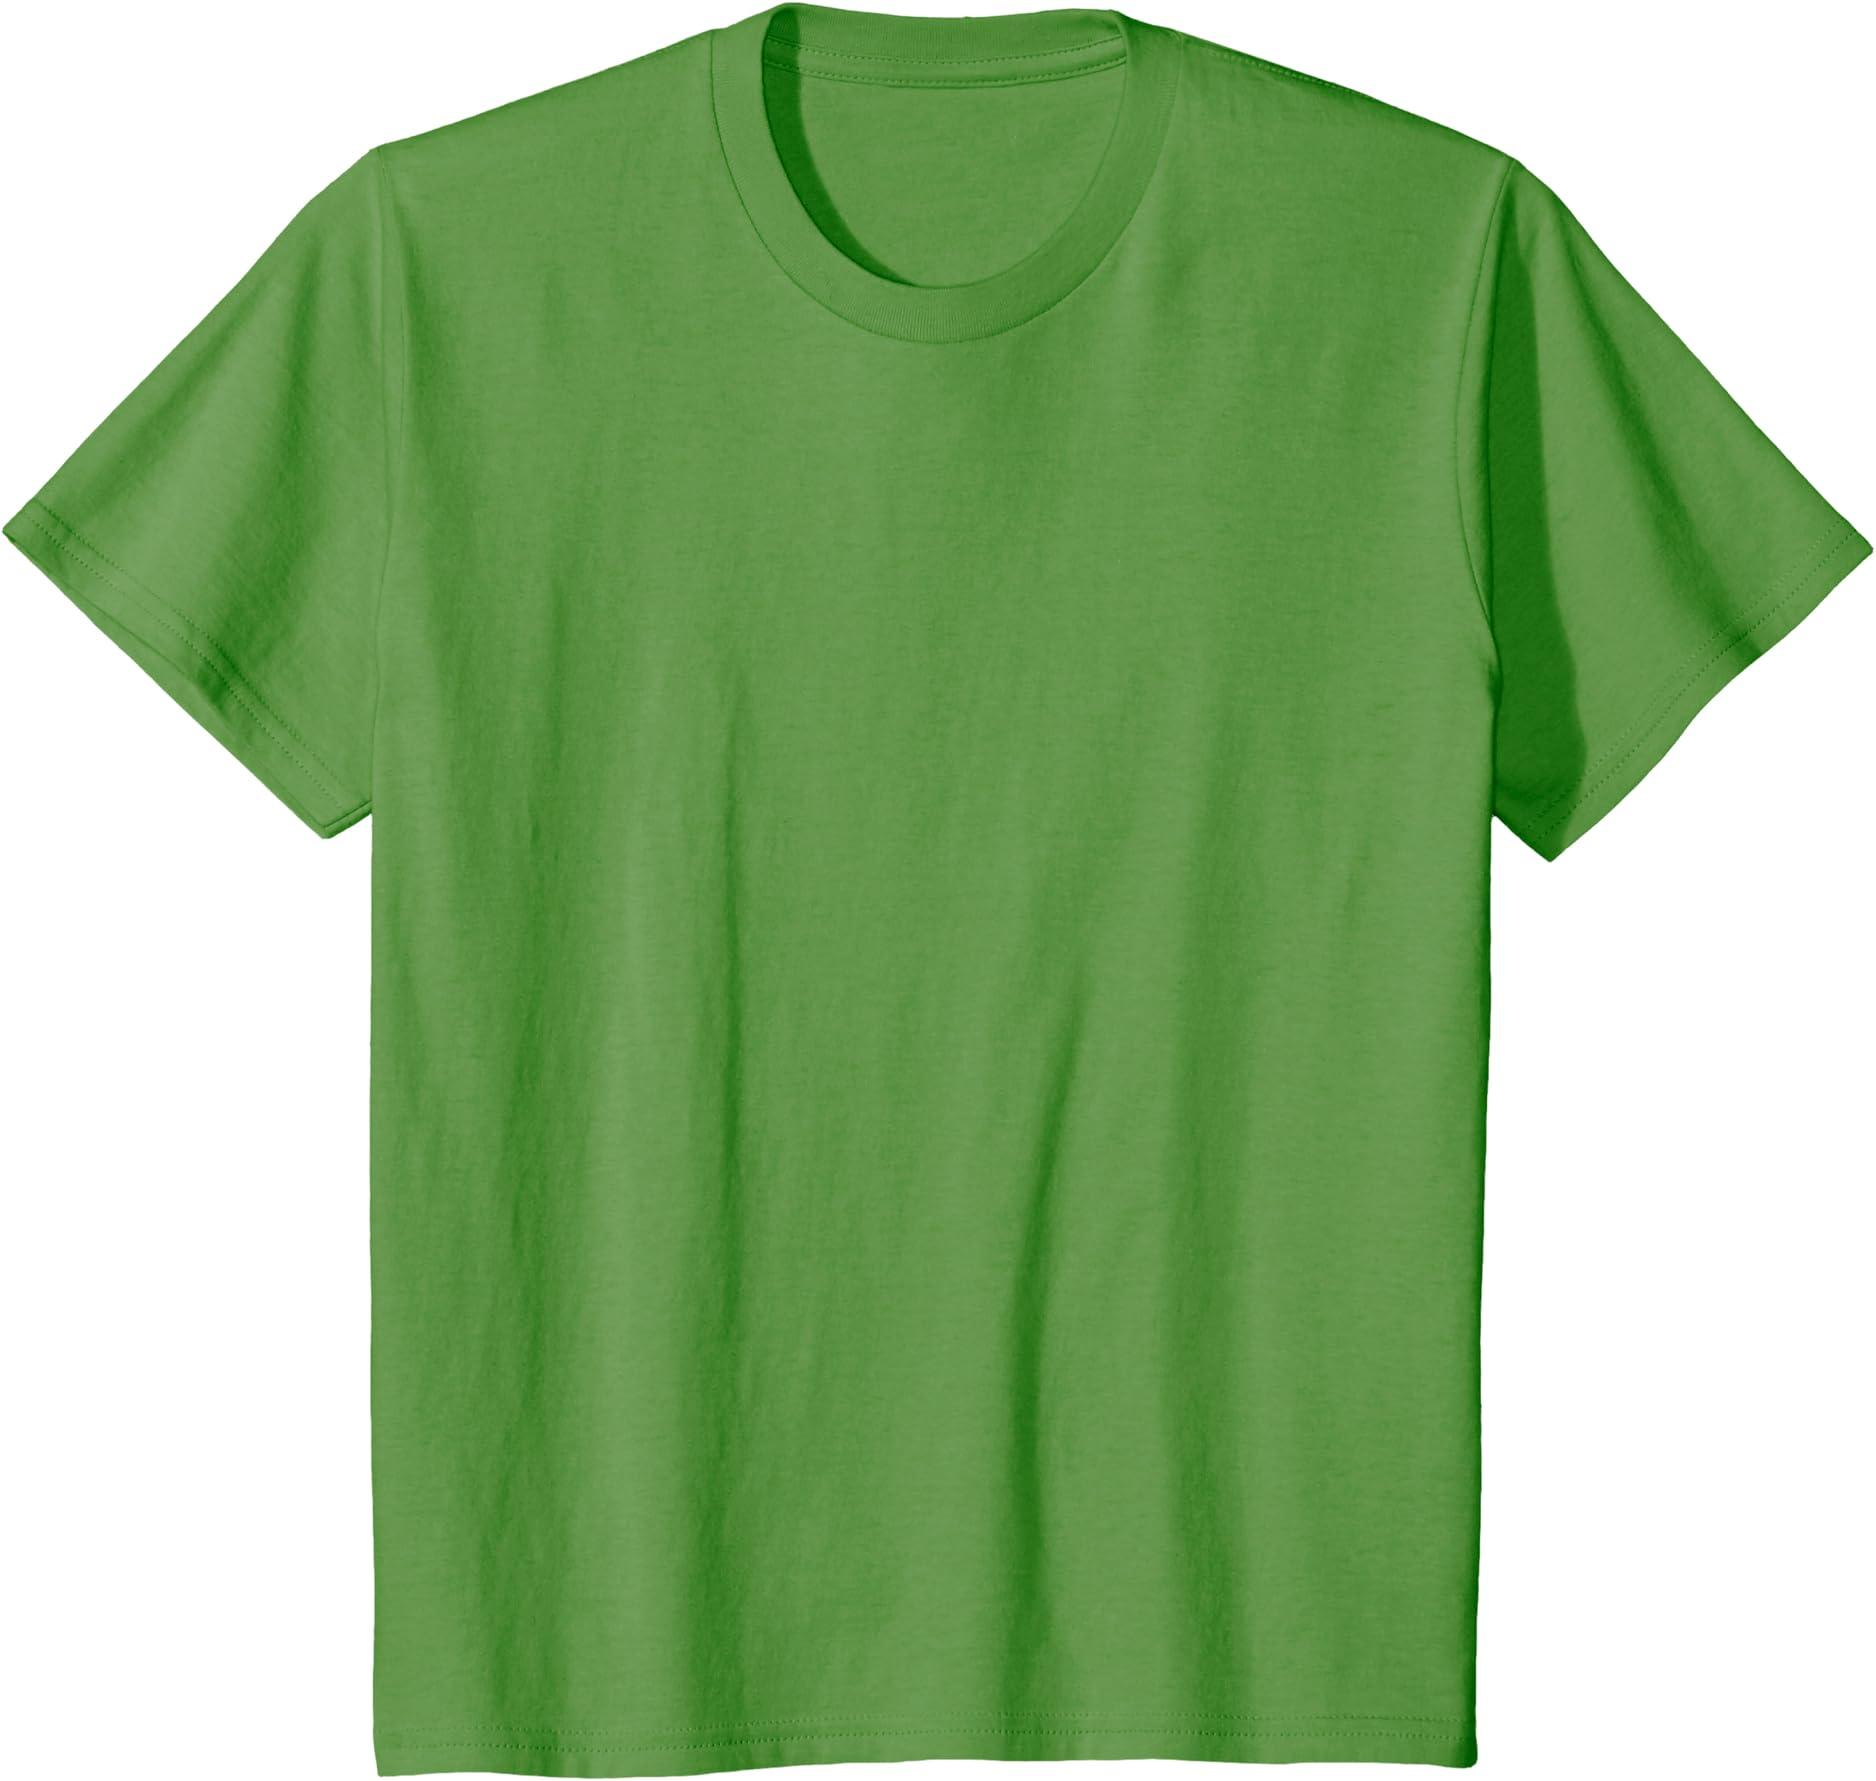 Patricks Day Infant T-Shirt SpiritForged Apparel 1st ST